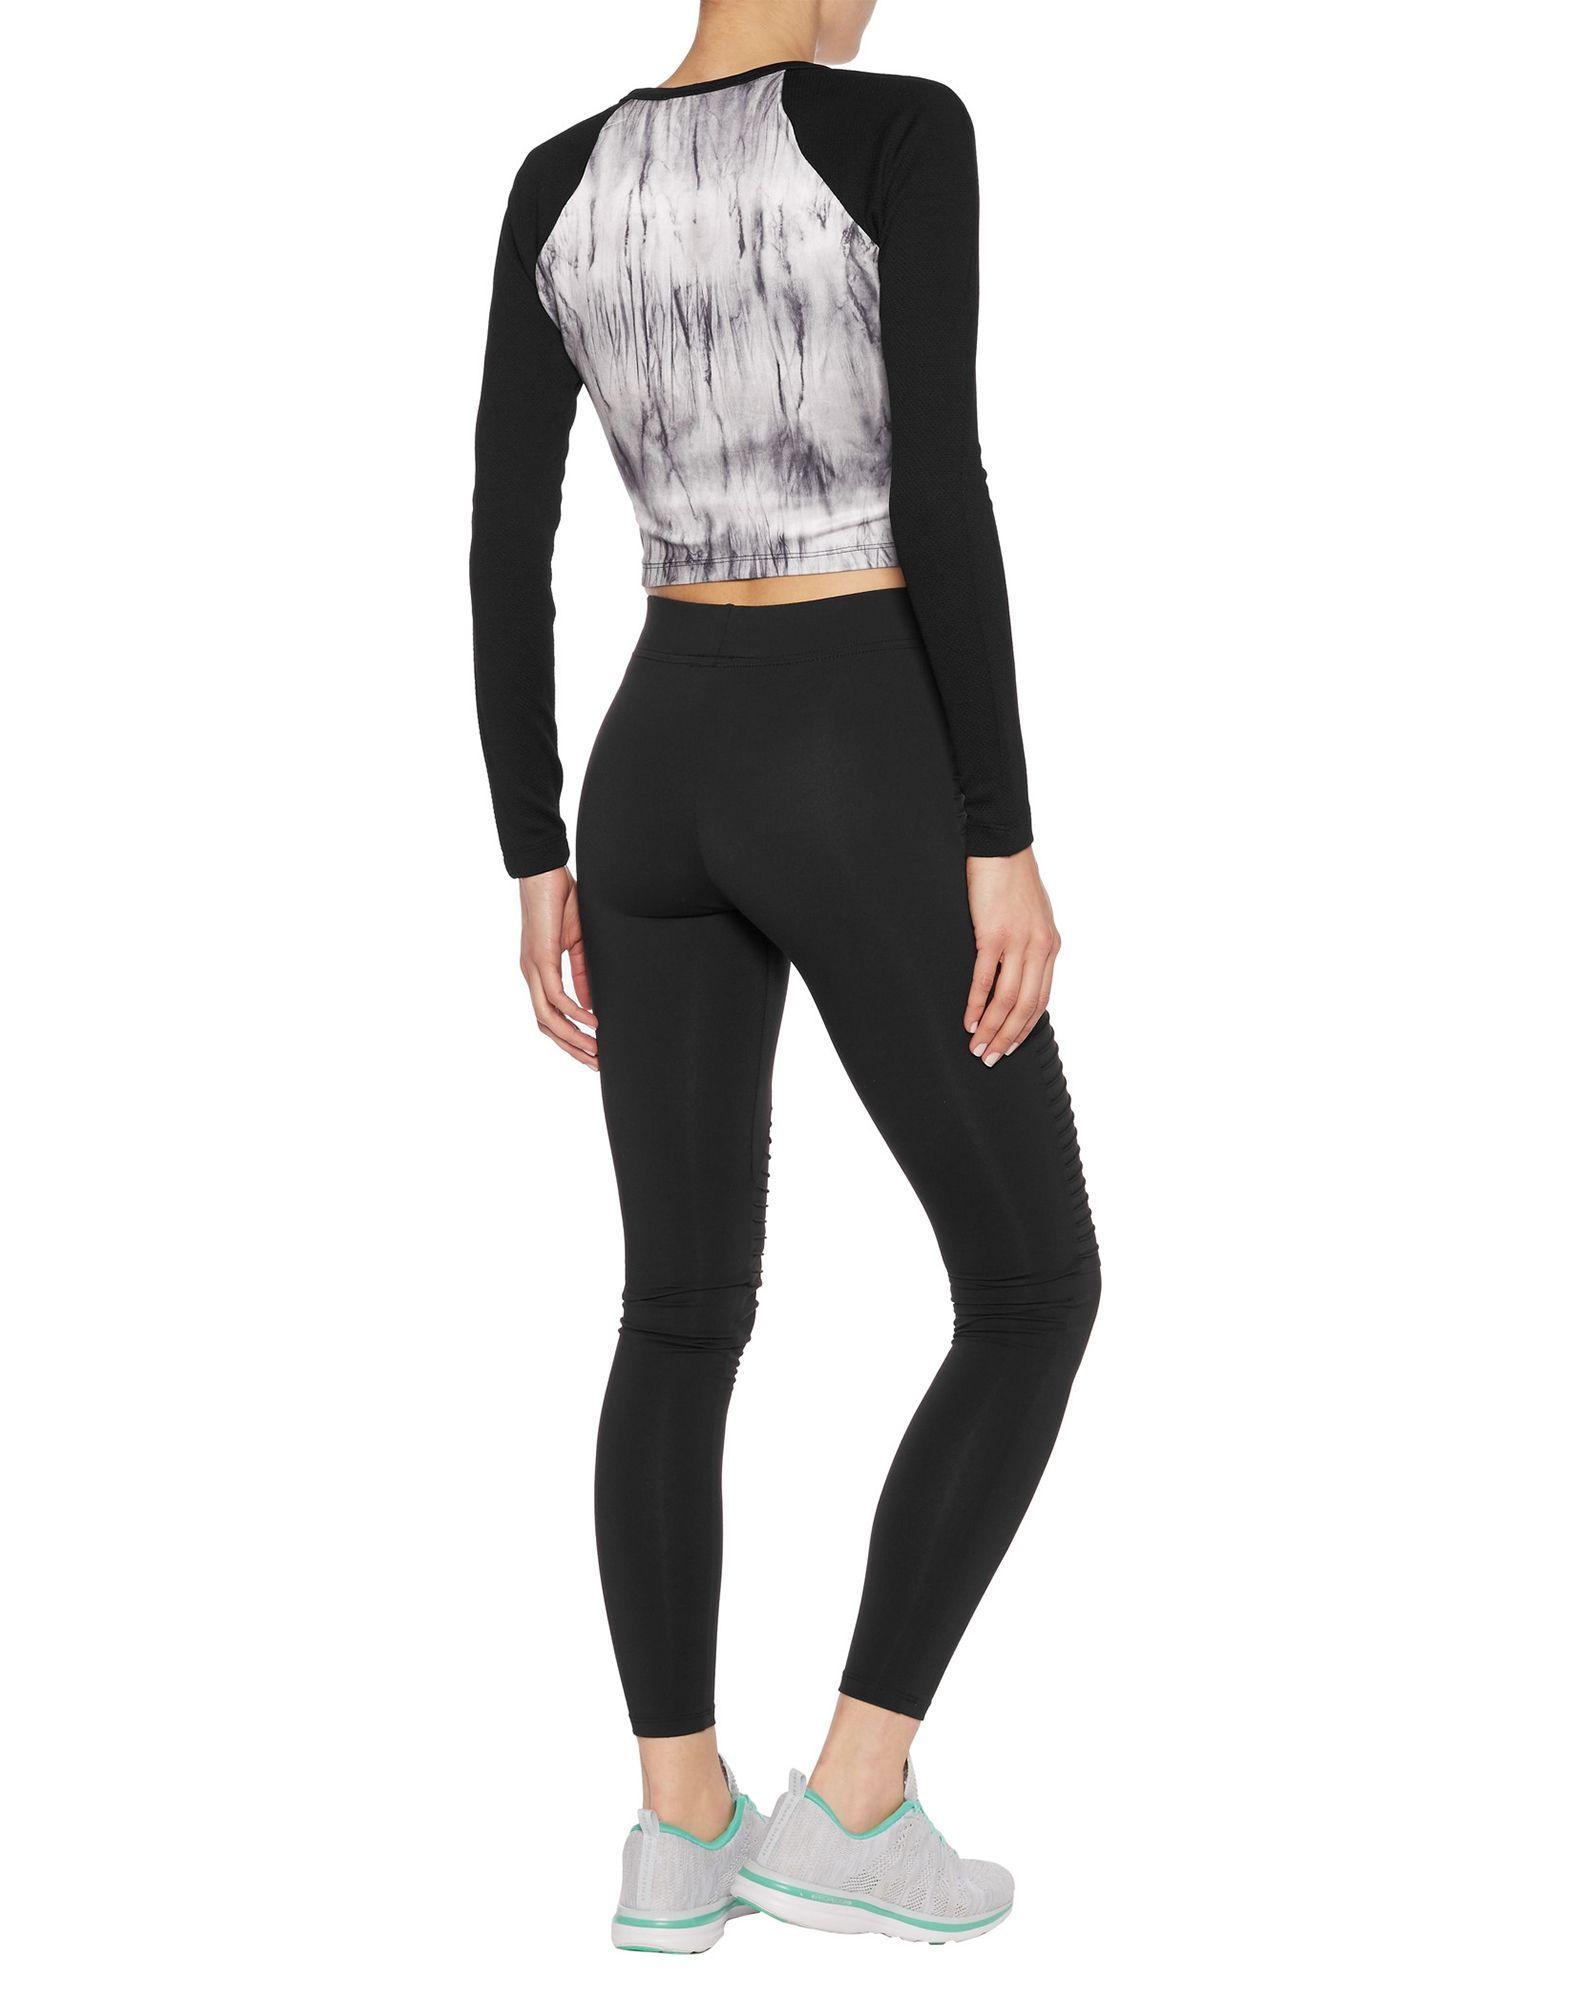 Topwear Kain Black Women's Polyester